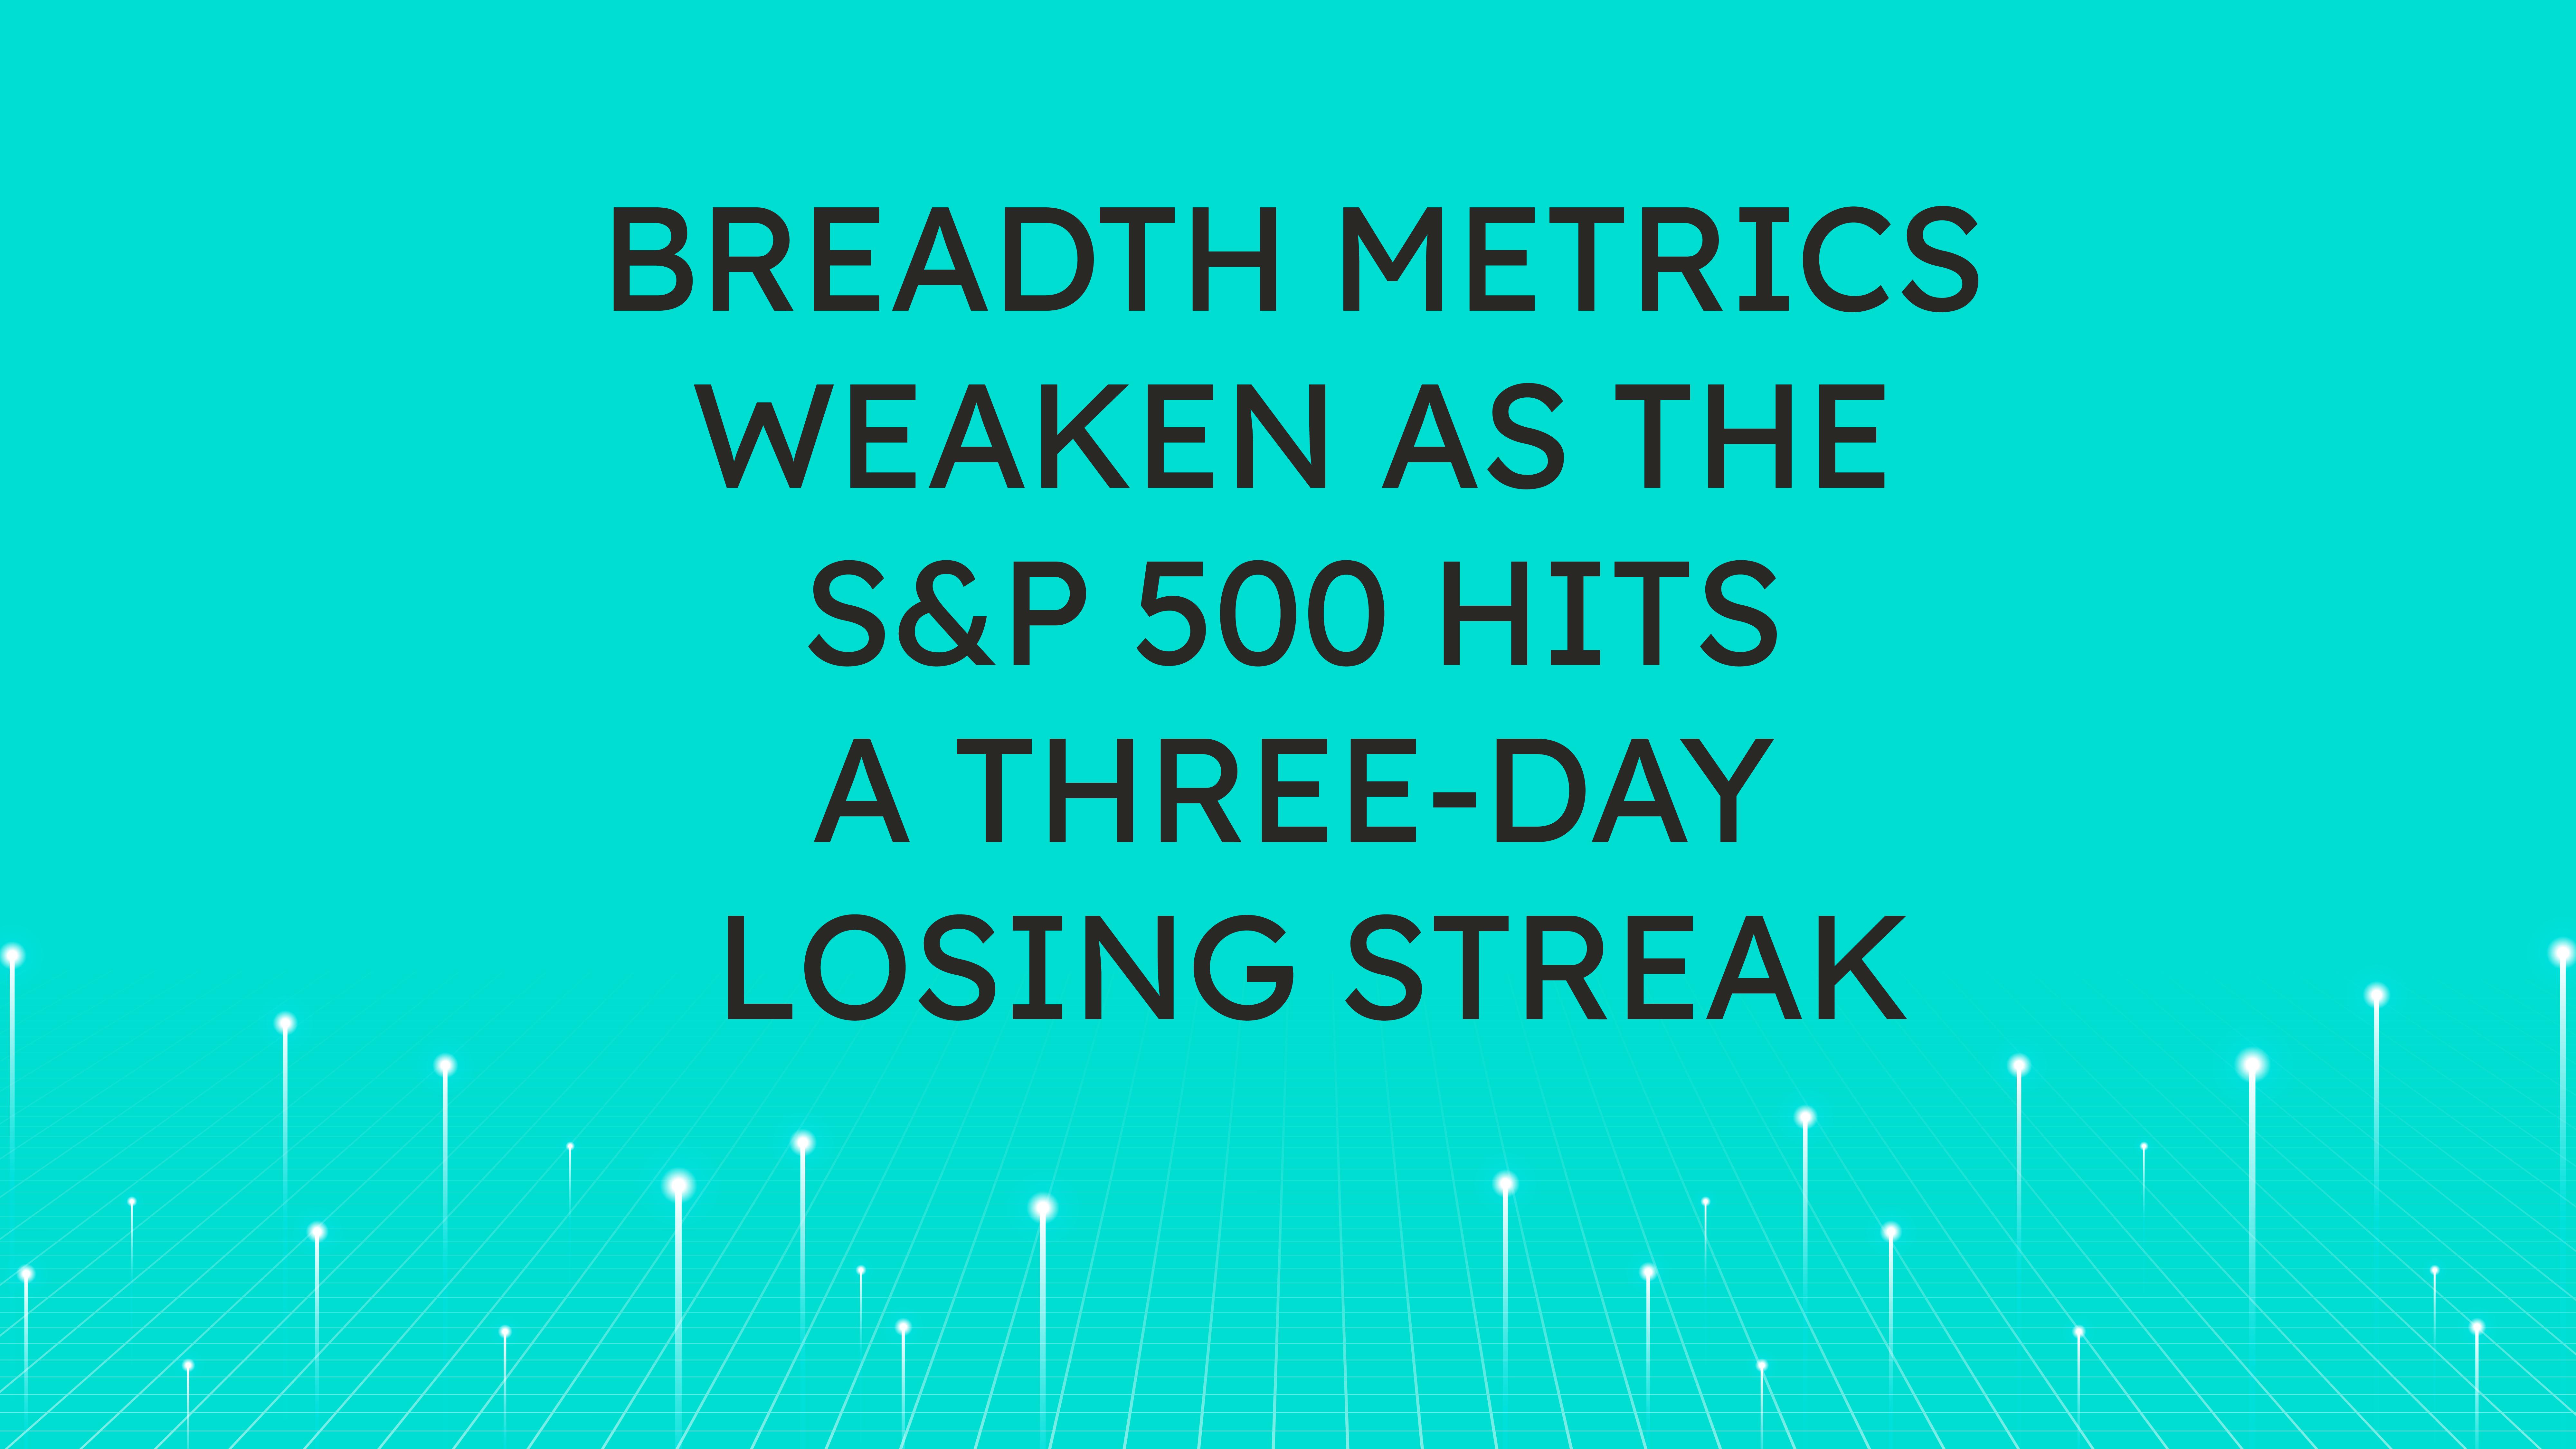 Breadth Metrics Weaken  as the S&P 500 Hits a Three-Day Losing Streak